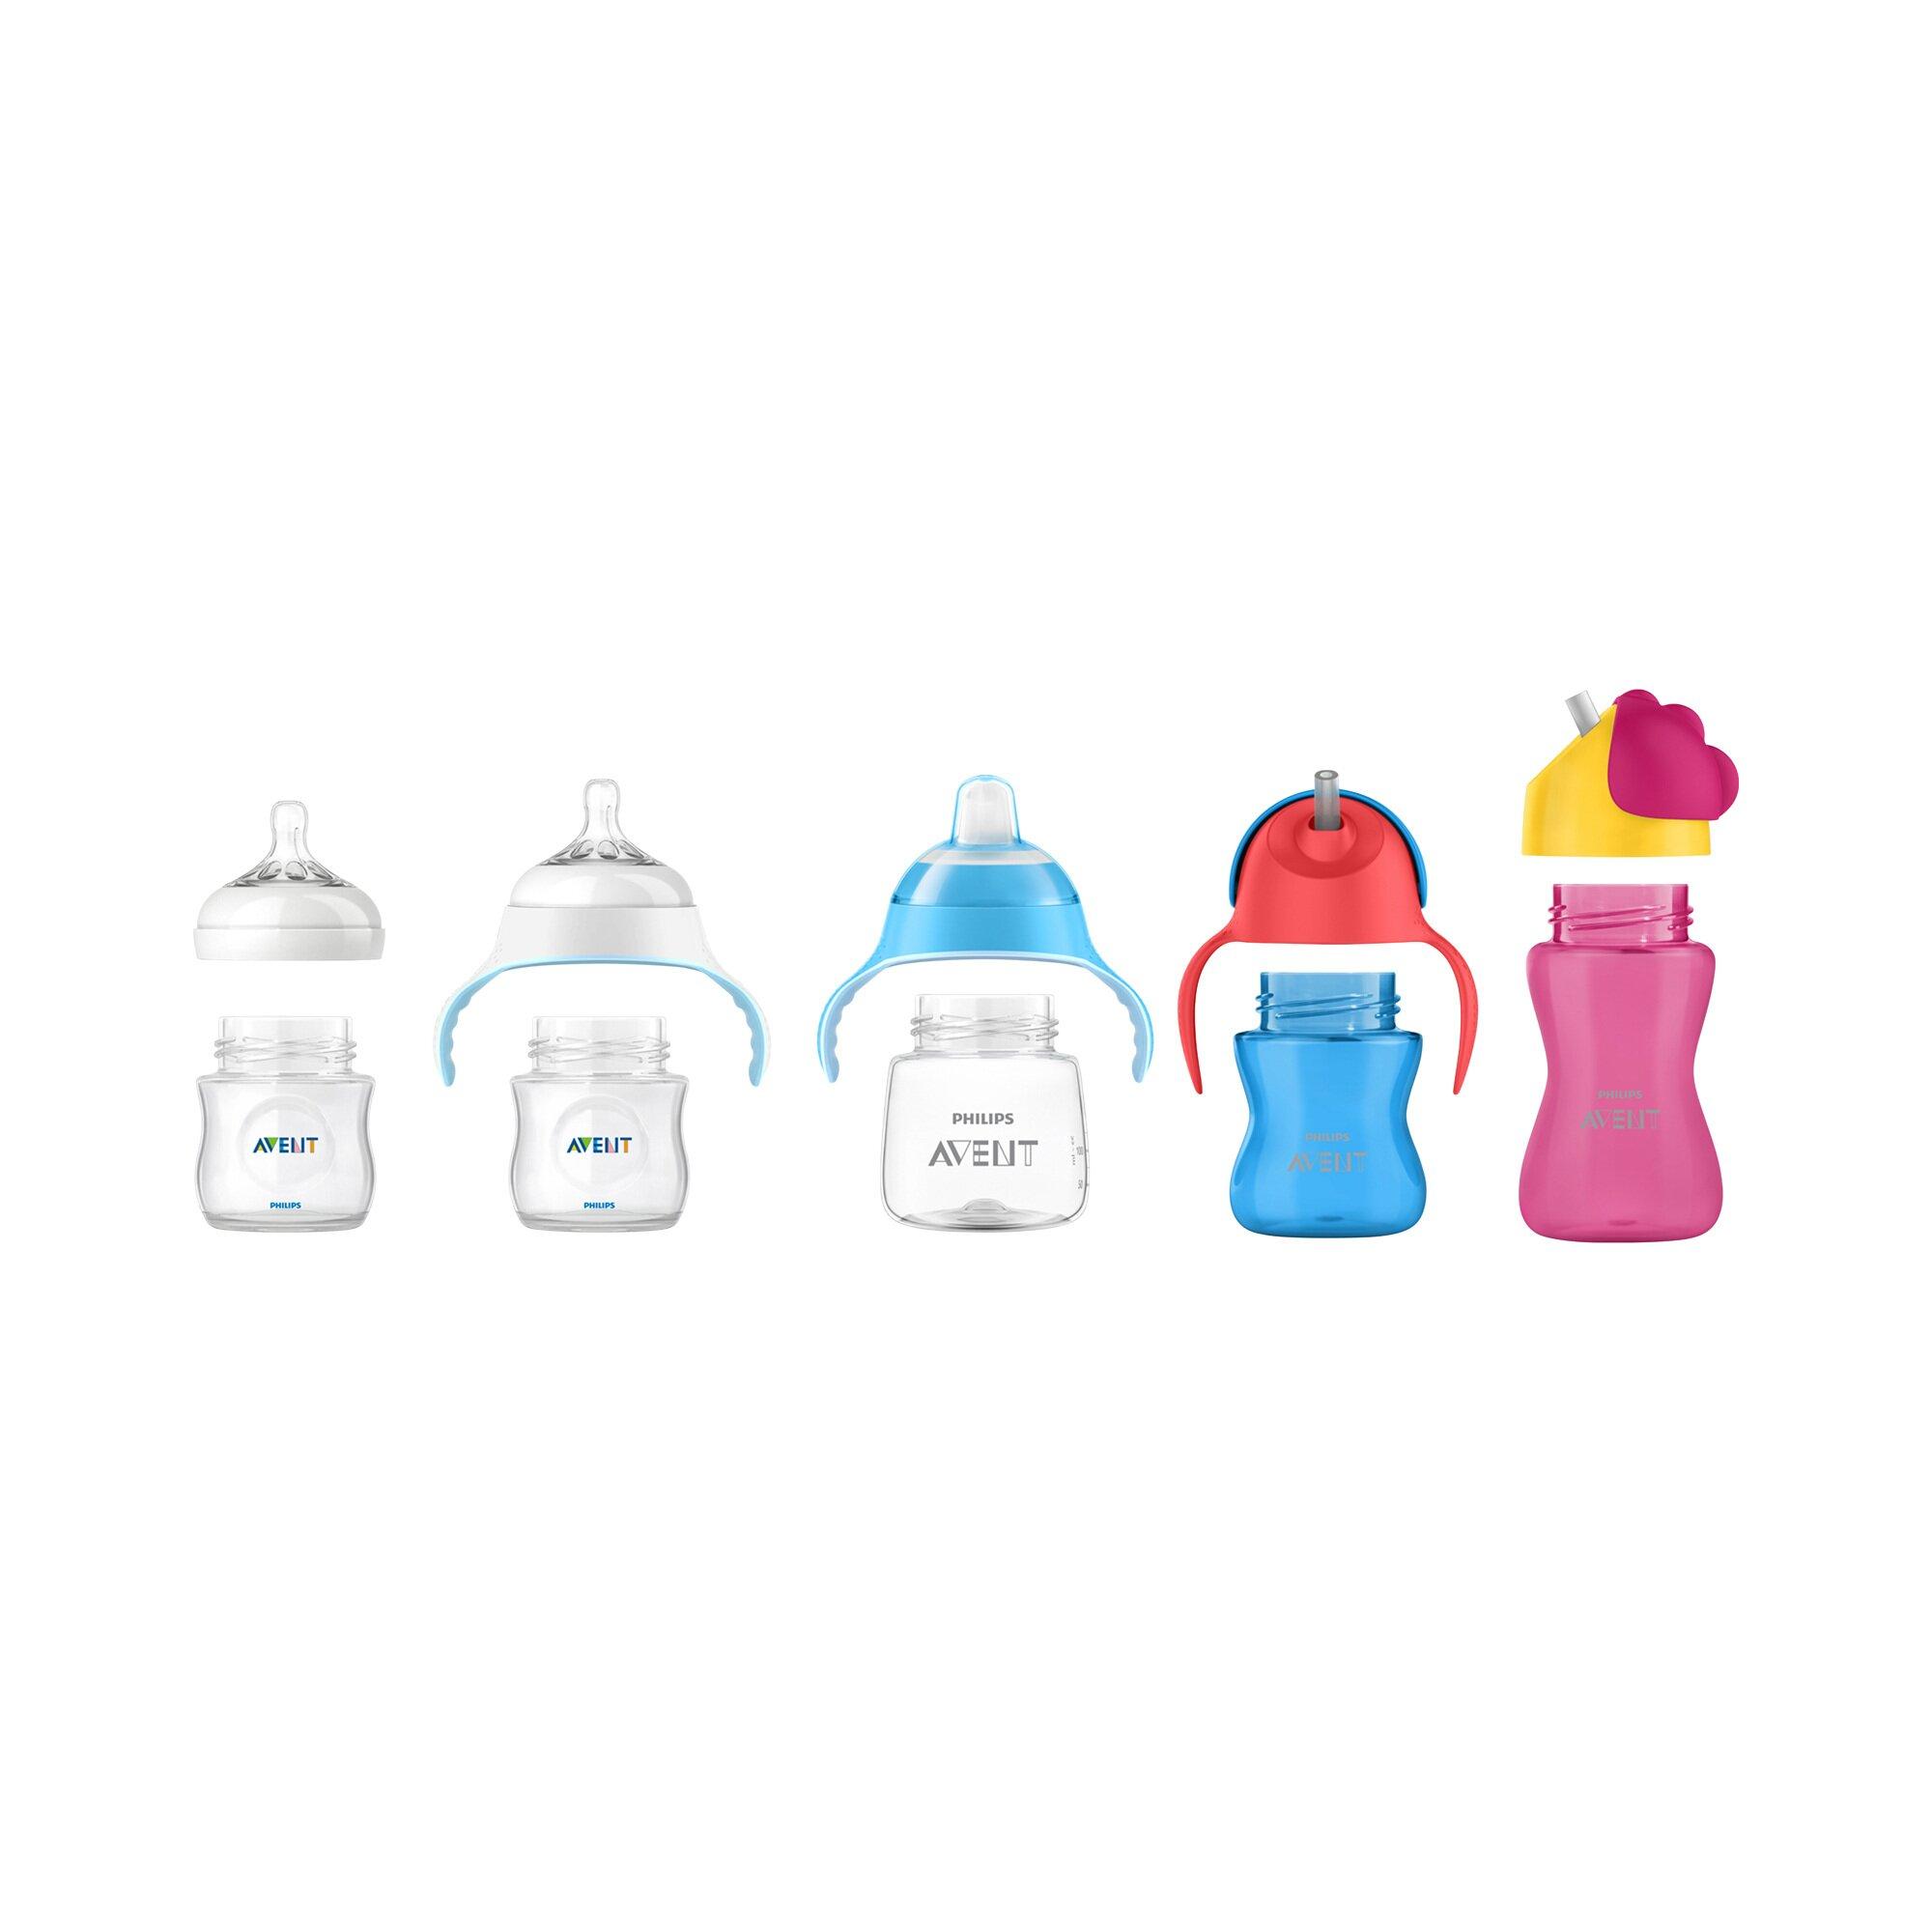 philips-avent-natural-neugeborenen-starter-set-scd290-05-vorteilspack